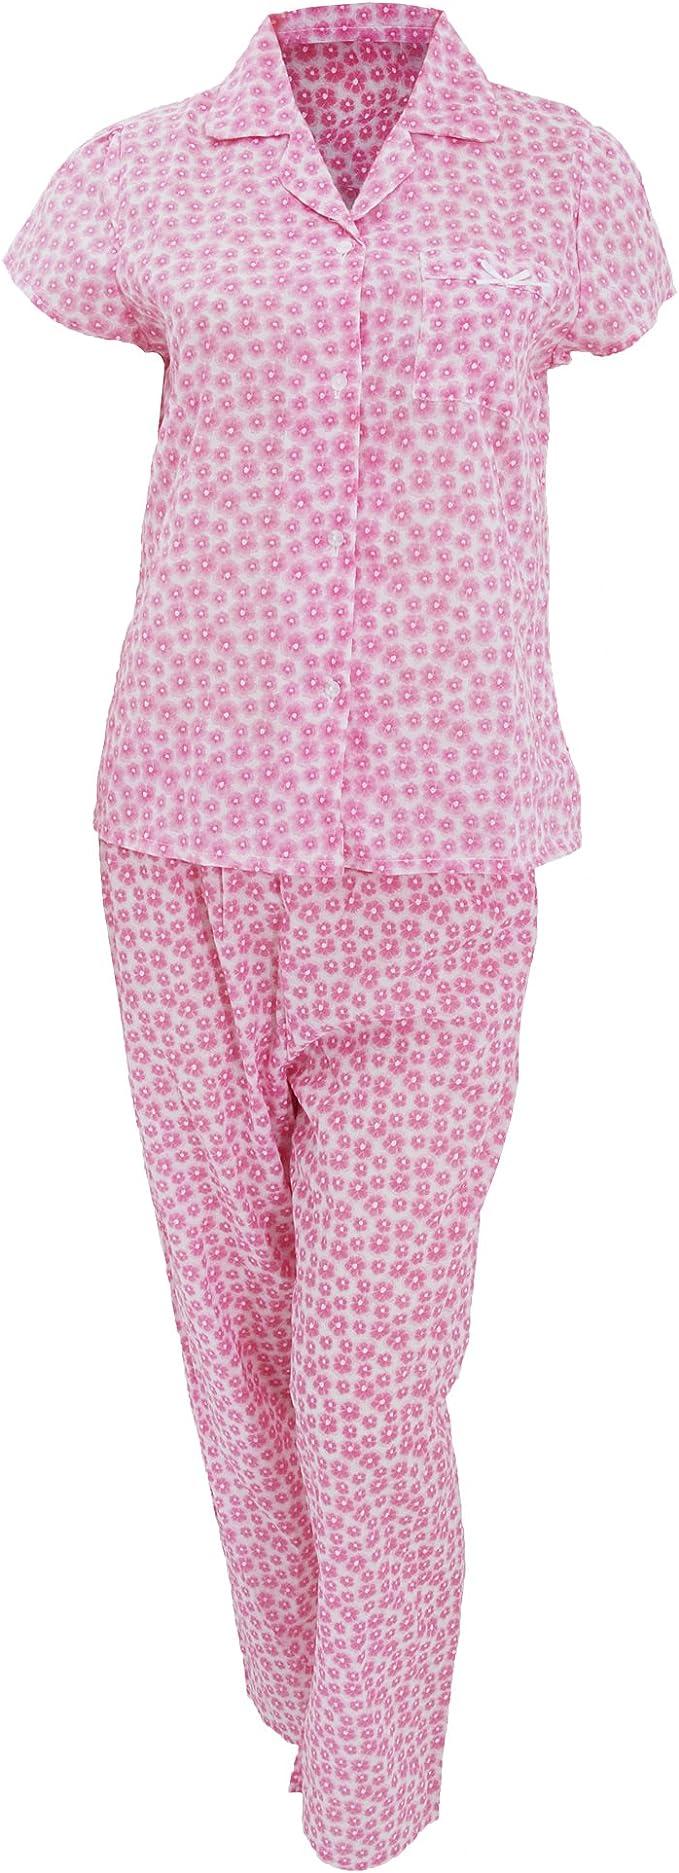 L9WEI Damen Schlafanzug V-Ausschnitt Hausanzug Set Pyjama Kurz Hose Set Loose Sleepshirt und Shorts Nachthemd Nachtw/äsche Kurzarm Sleepwear